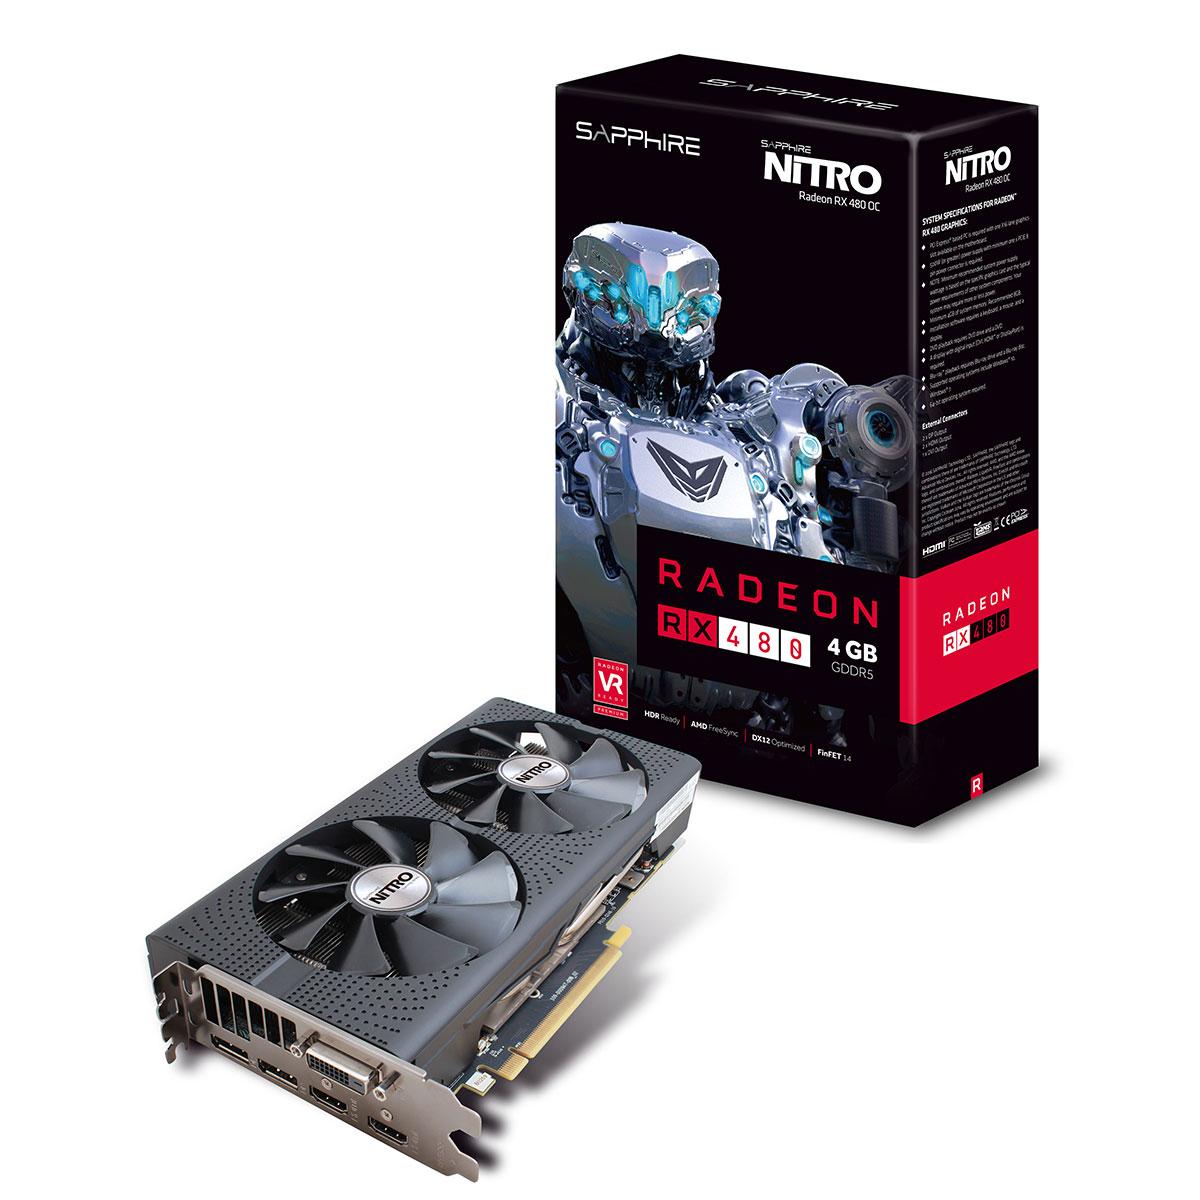 Carte graphique AMD Sapphire Nitro Radeon RX 480 4G (Reconditionné - Premium)